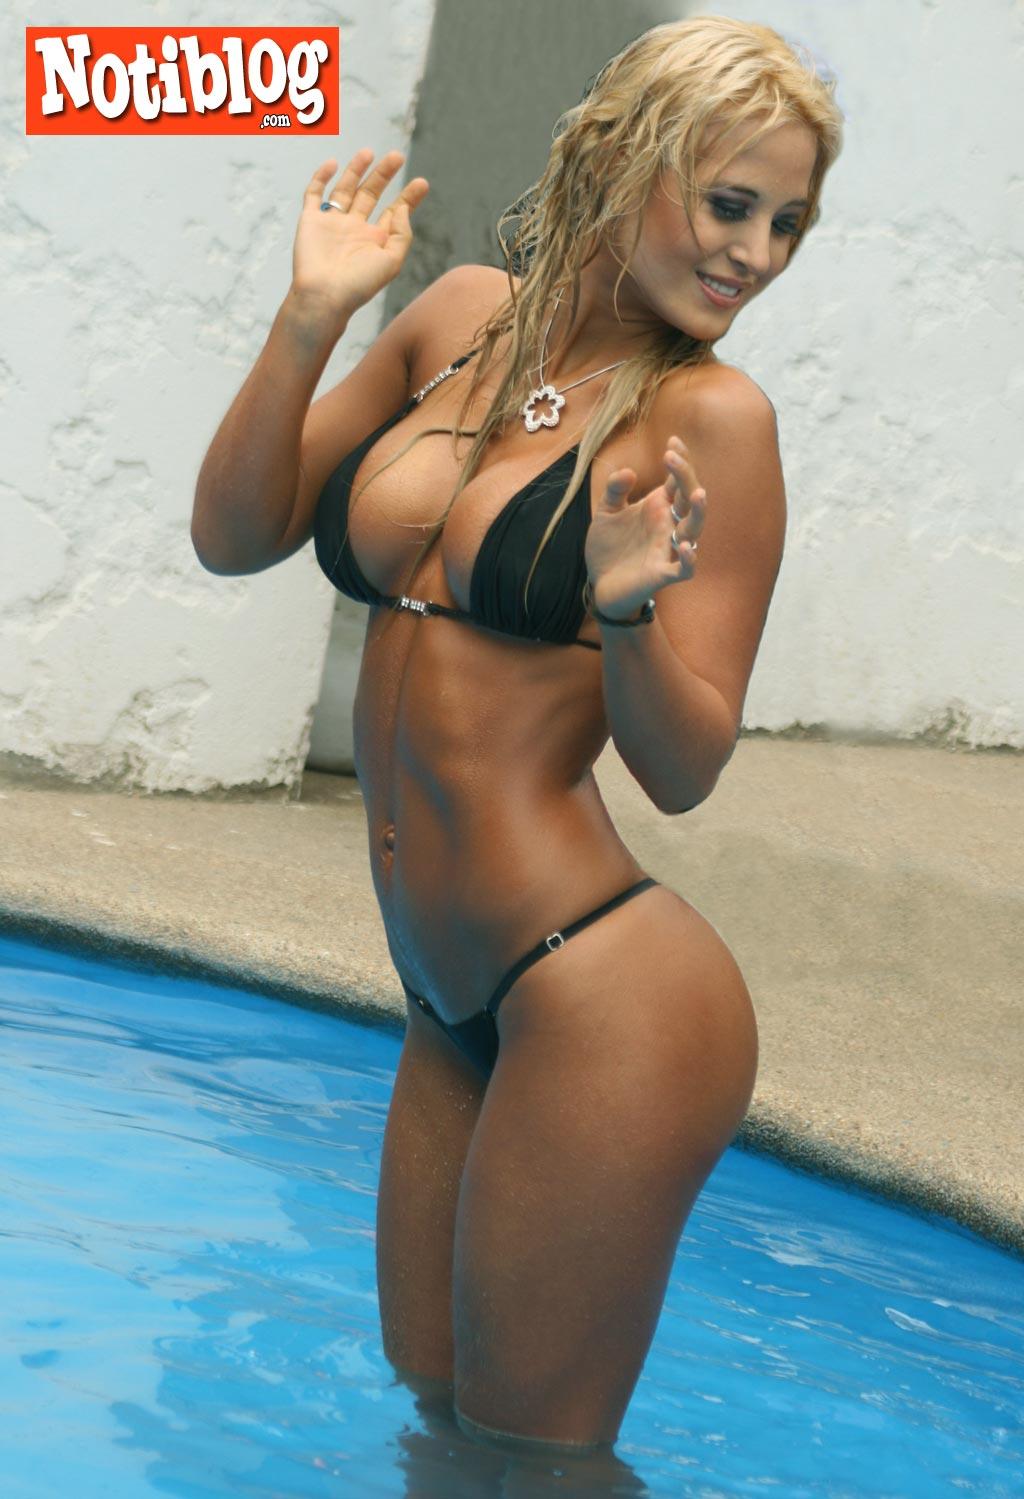 http://1.bp.blogspot.com/_2OOtcU5P9YE/SxWVMq6zroI/AAAAAAAAAR8/xAqux77qwLg/s1600/jesica-cirio-f6.jpg